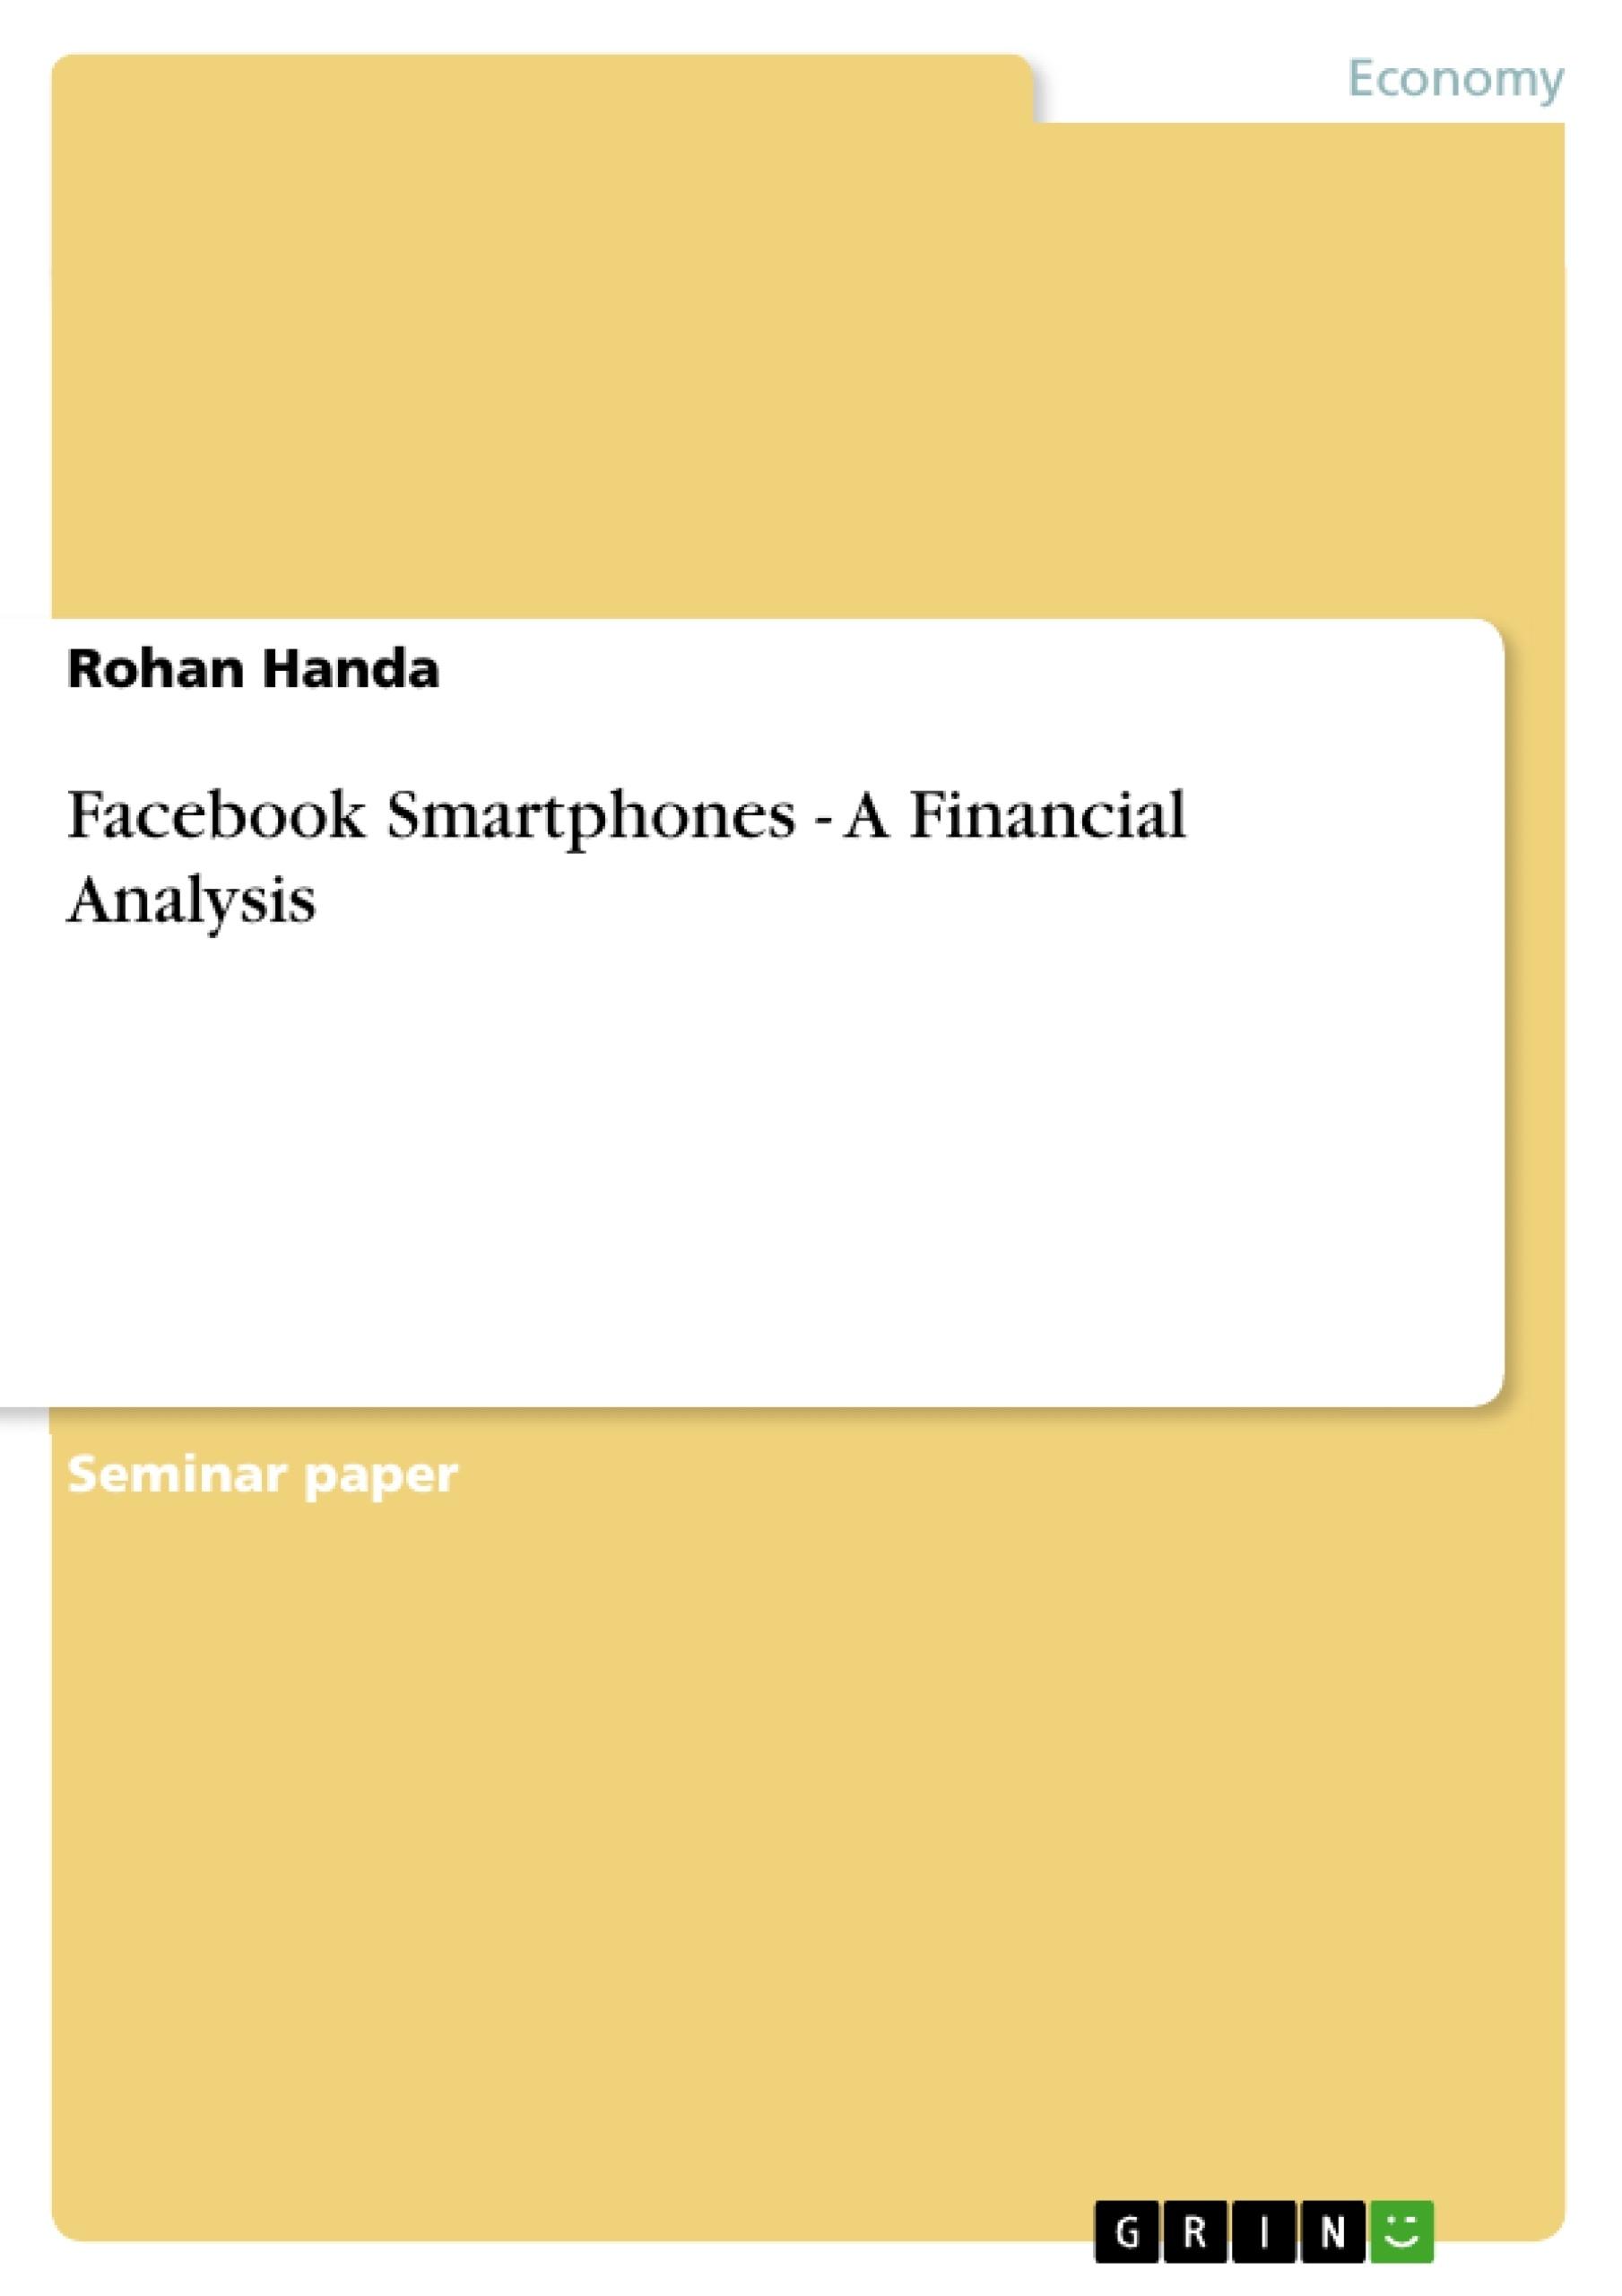 Title: Facebook Smartphones - A Financial Analysis